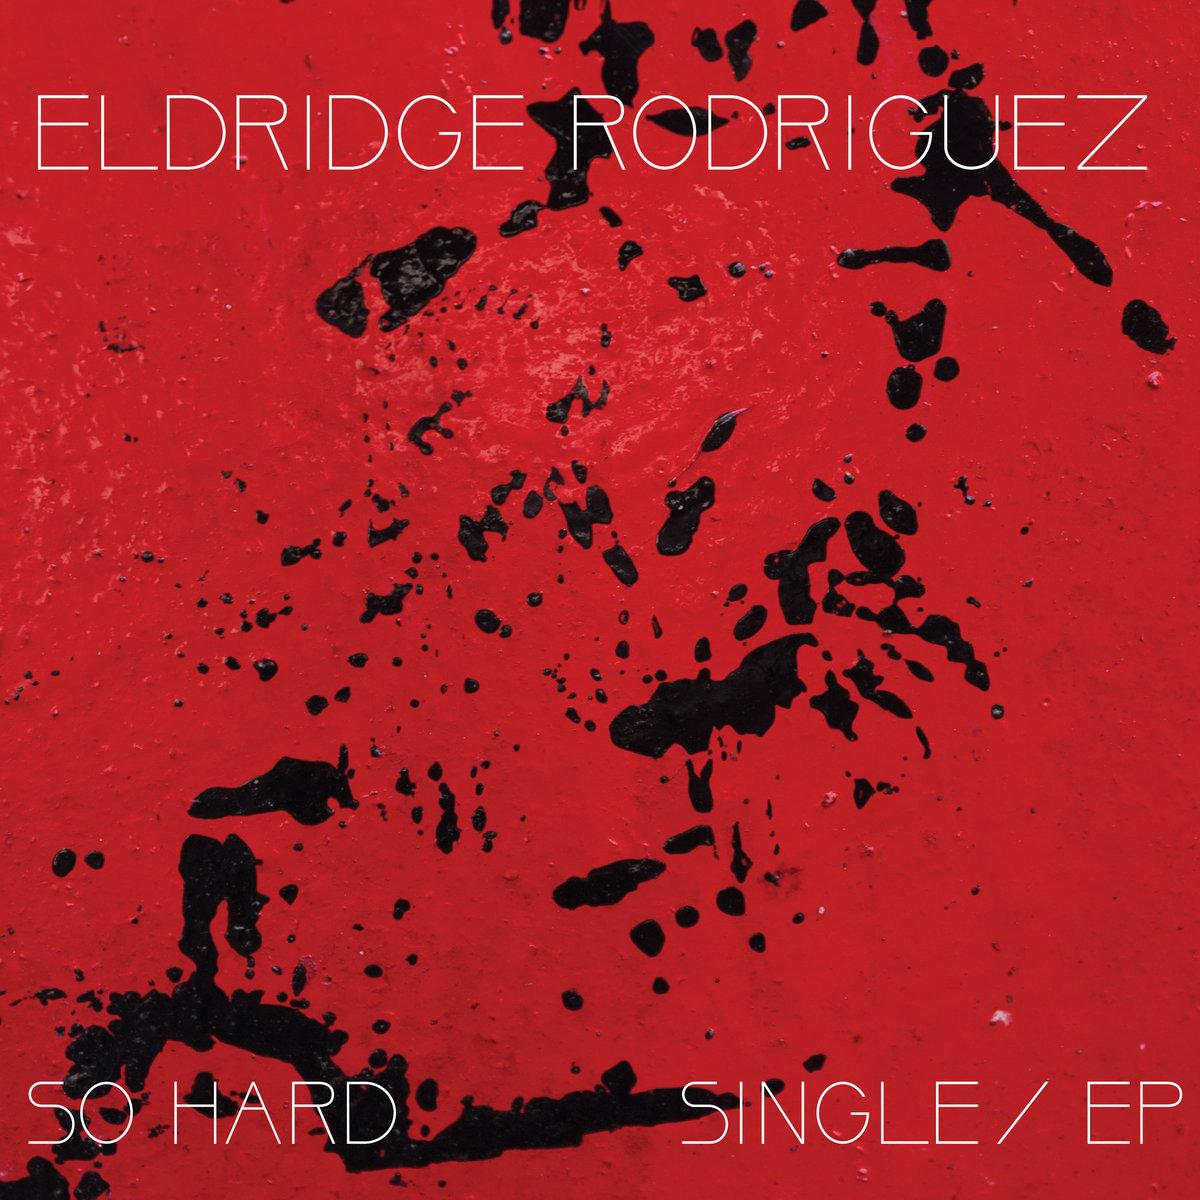 So Hard - EP/ Single